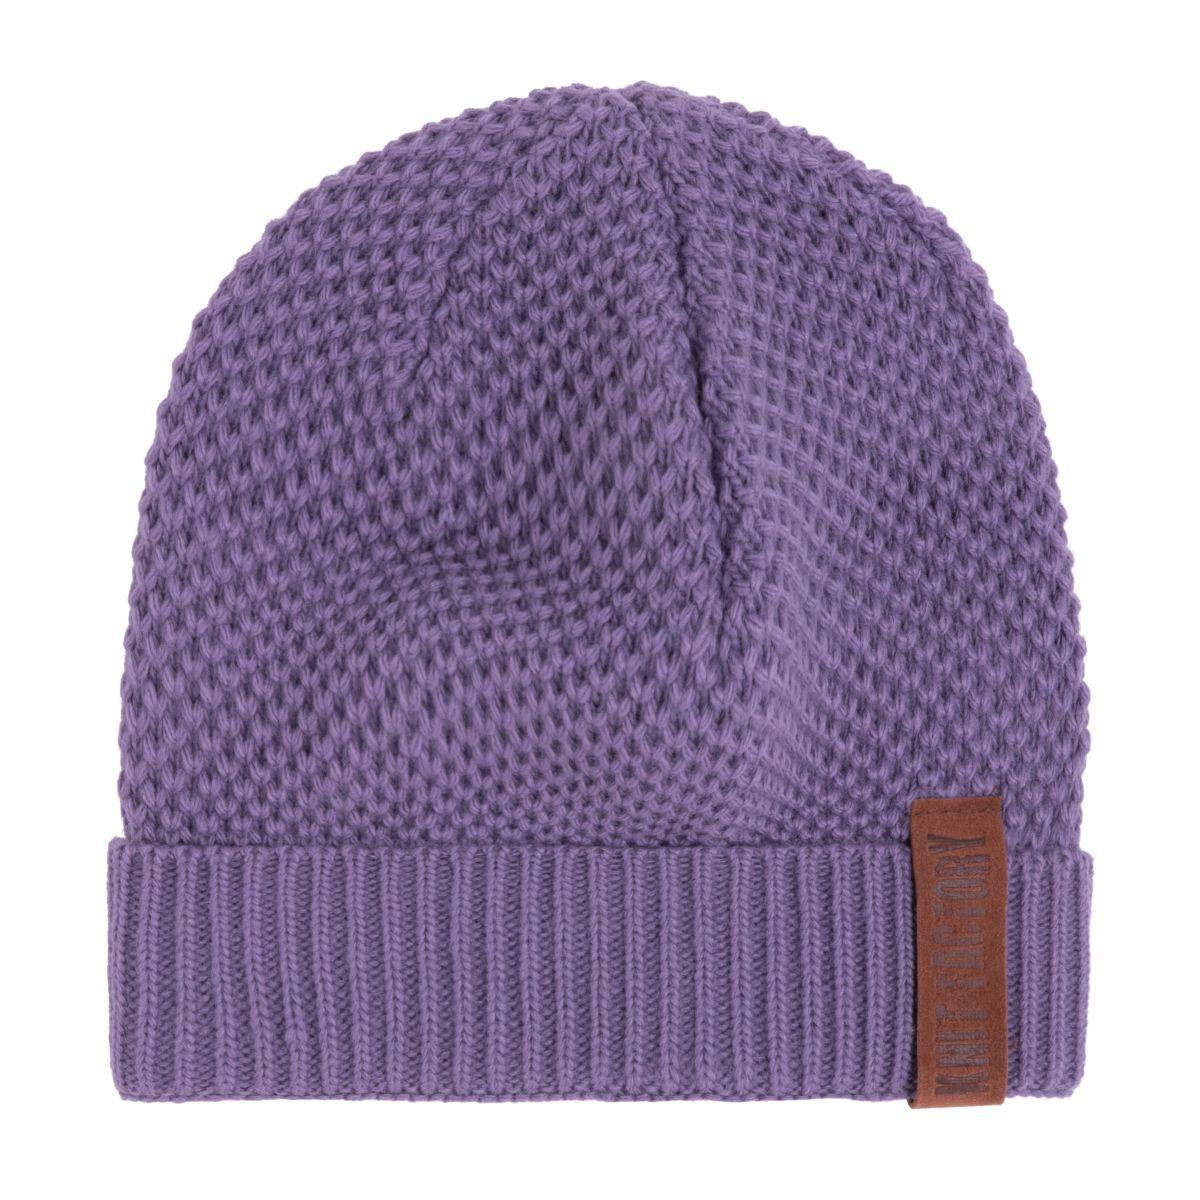 knit factory kf123070043 jazz muts violet 1